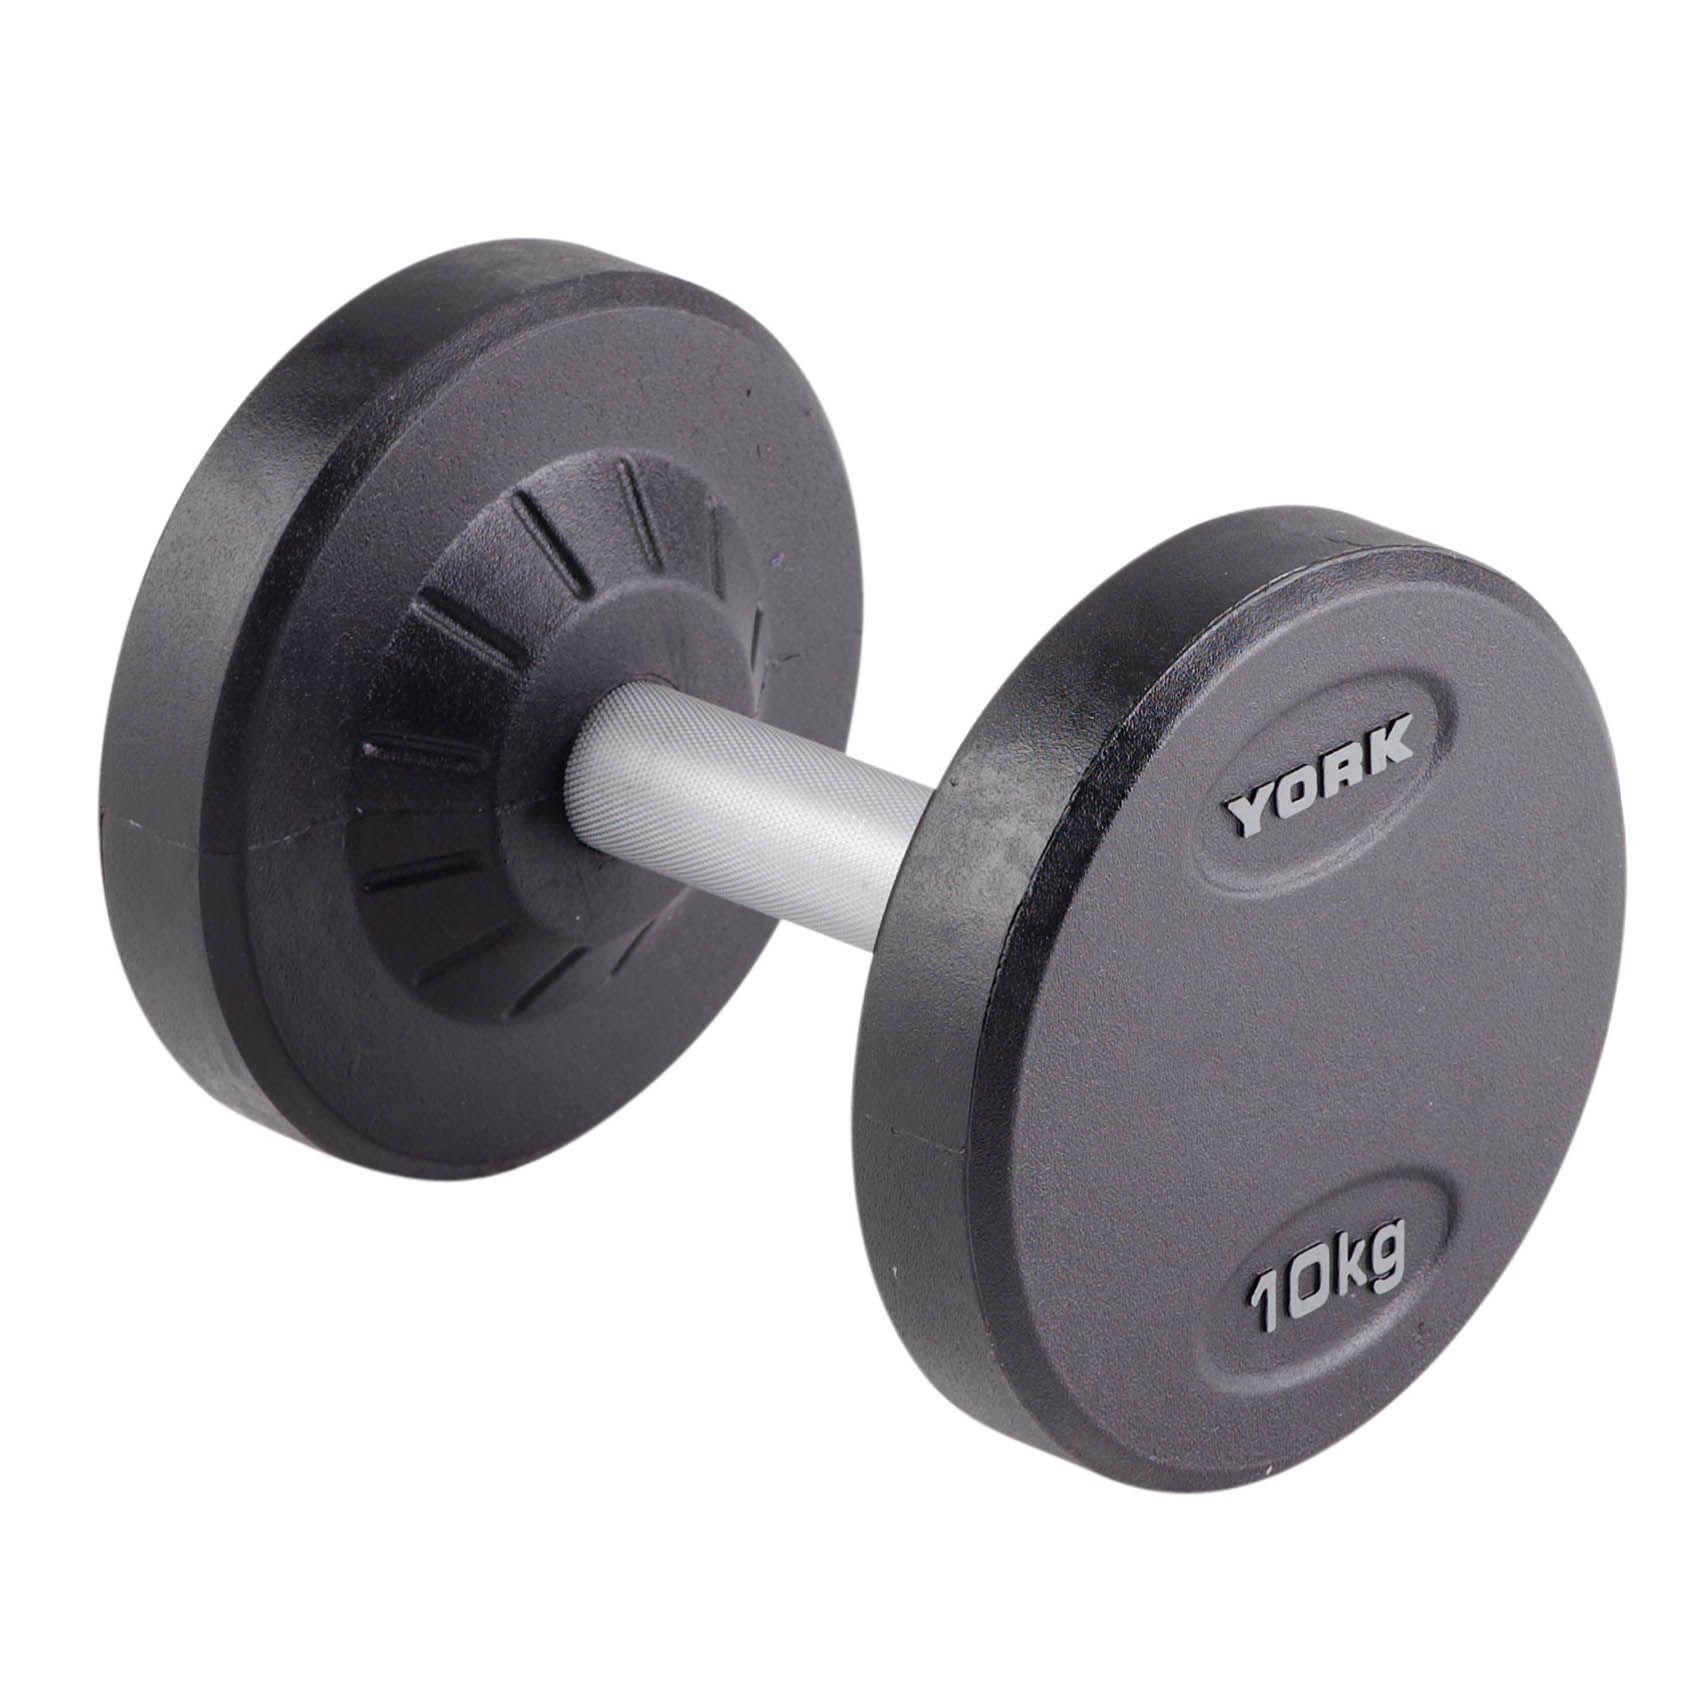 York 10kg Pro-Style Dumbbell - Sweatband.com